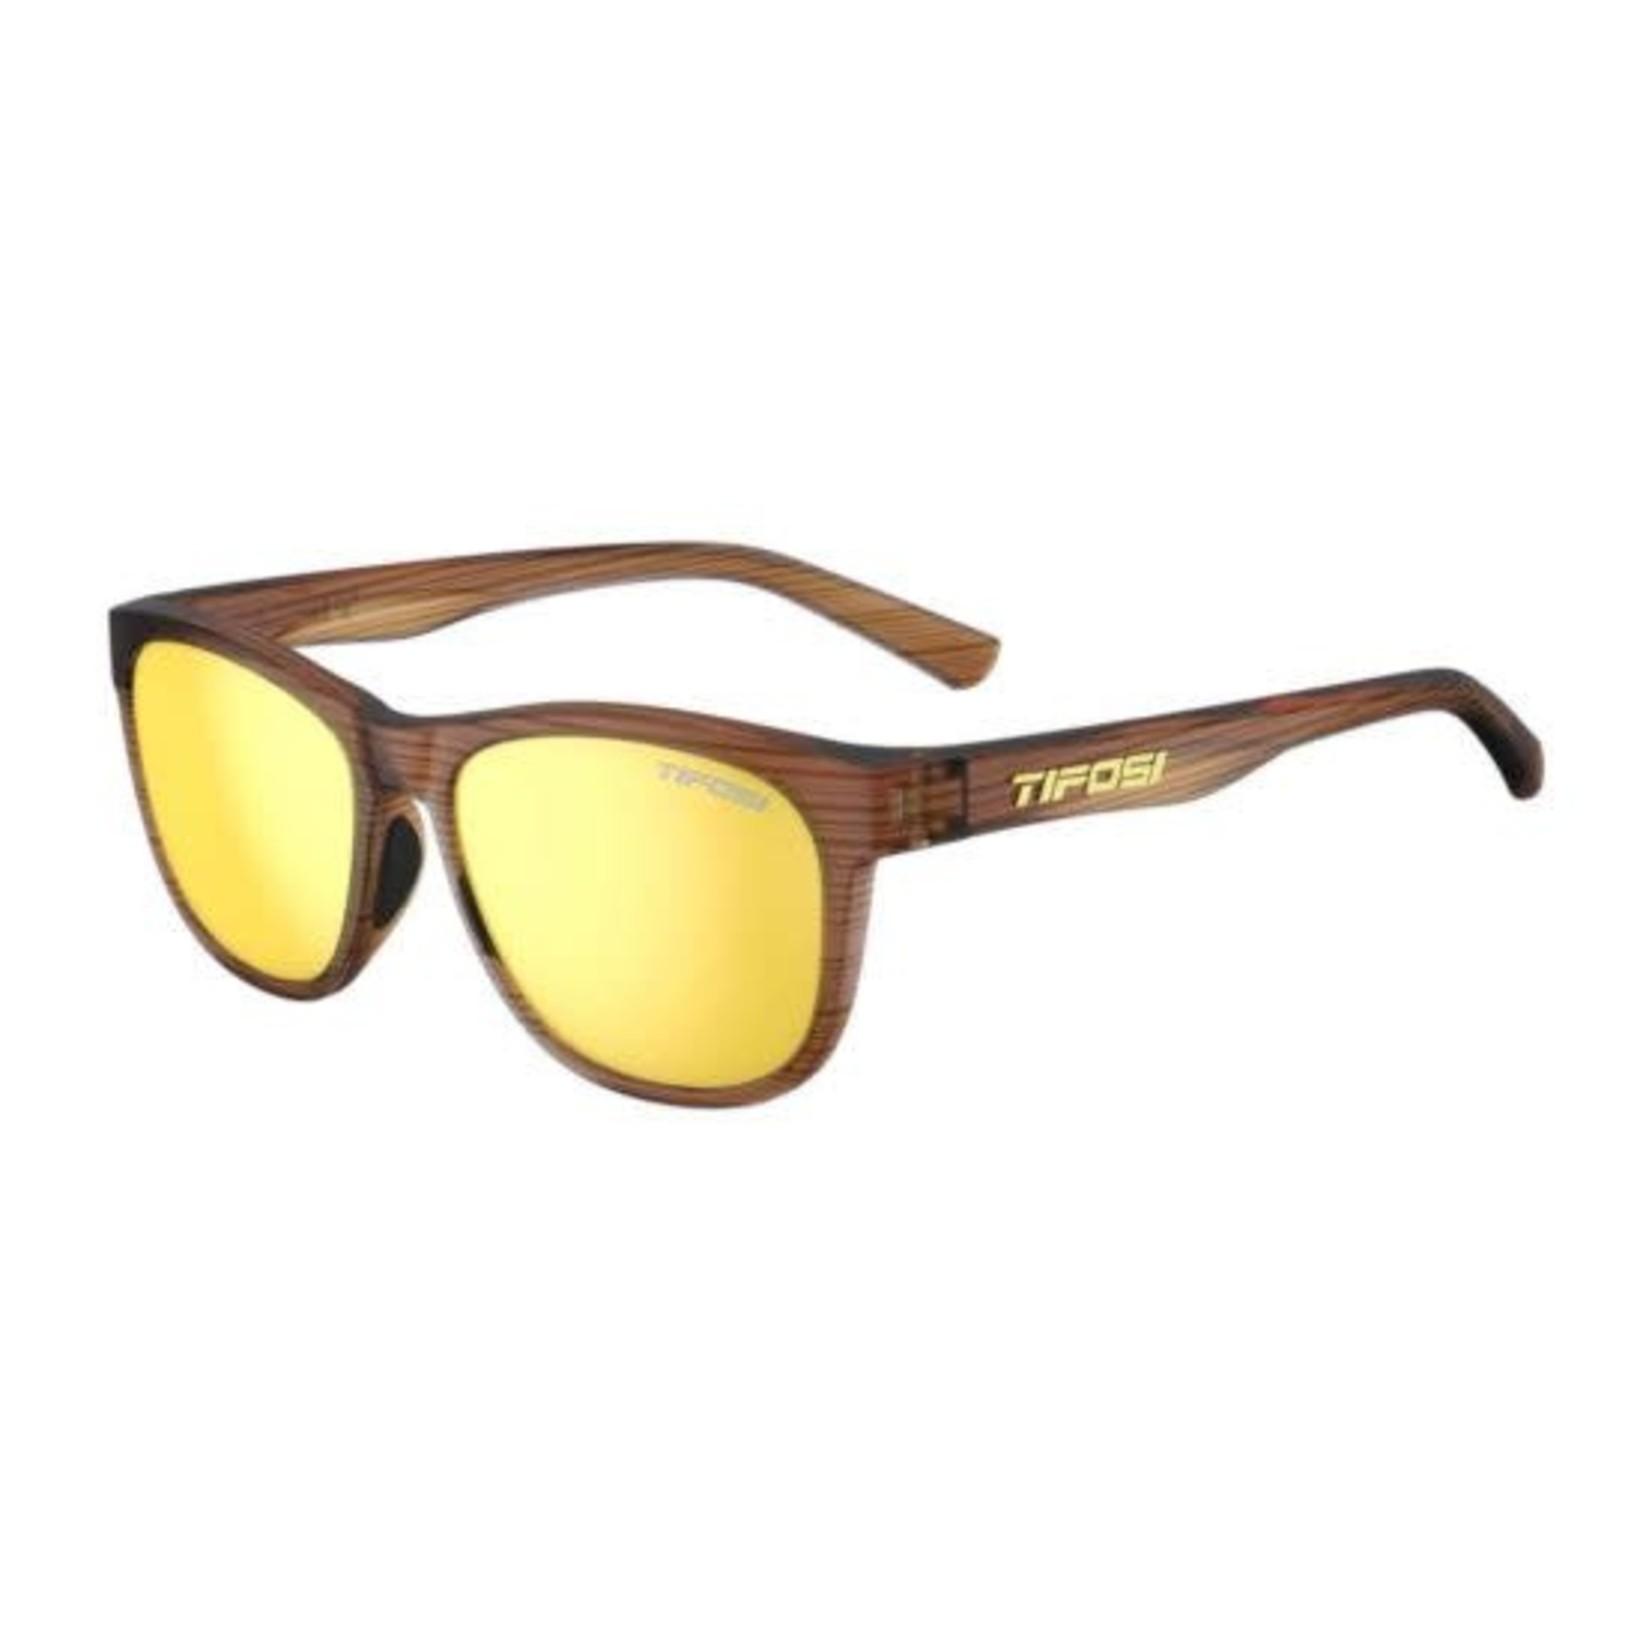 Tifosi Optics Swank, Woodgrain Single Lens Sunglasses